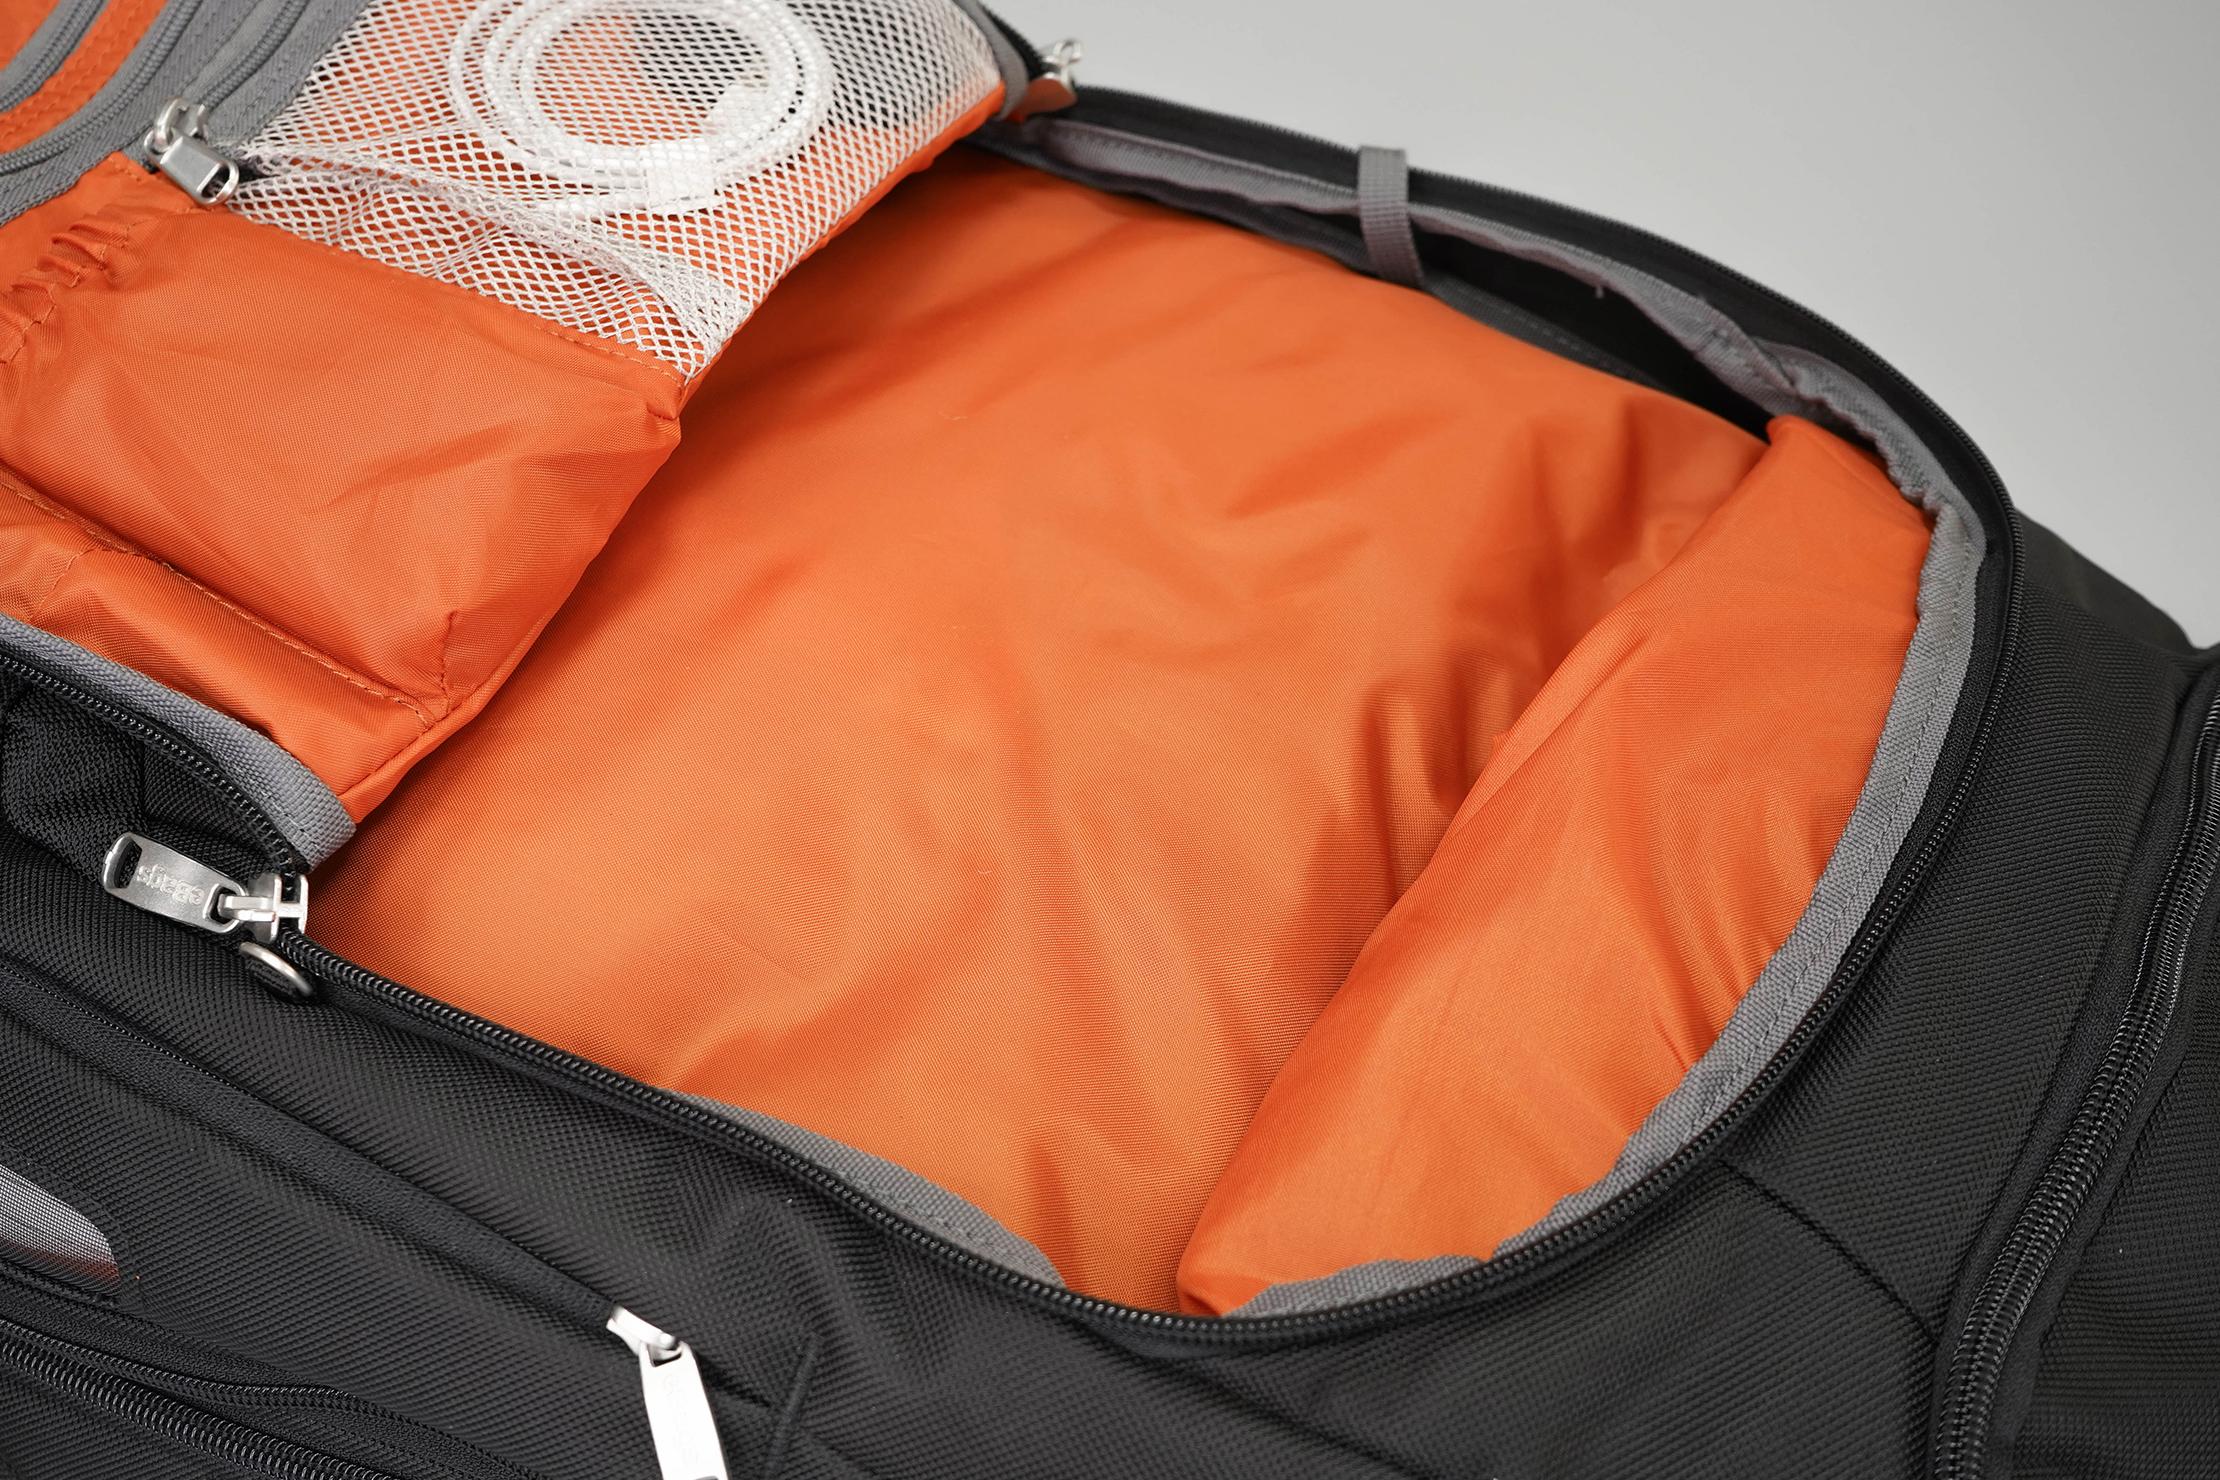 eBags TLS Mother Lode Weekender Convertible Inside Material